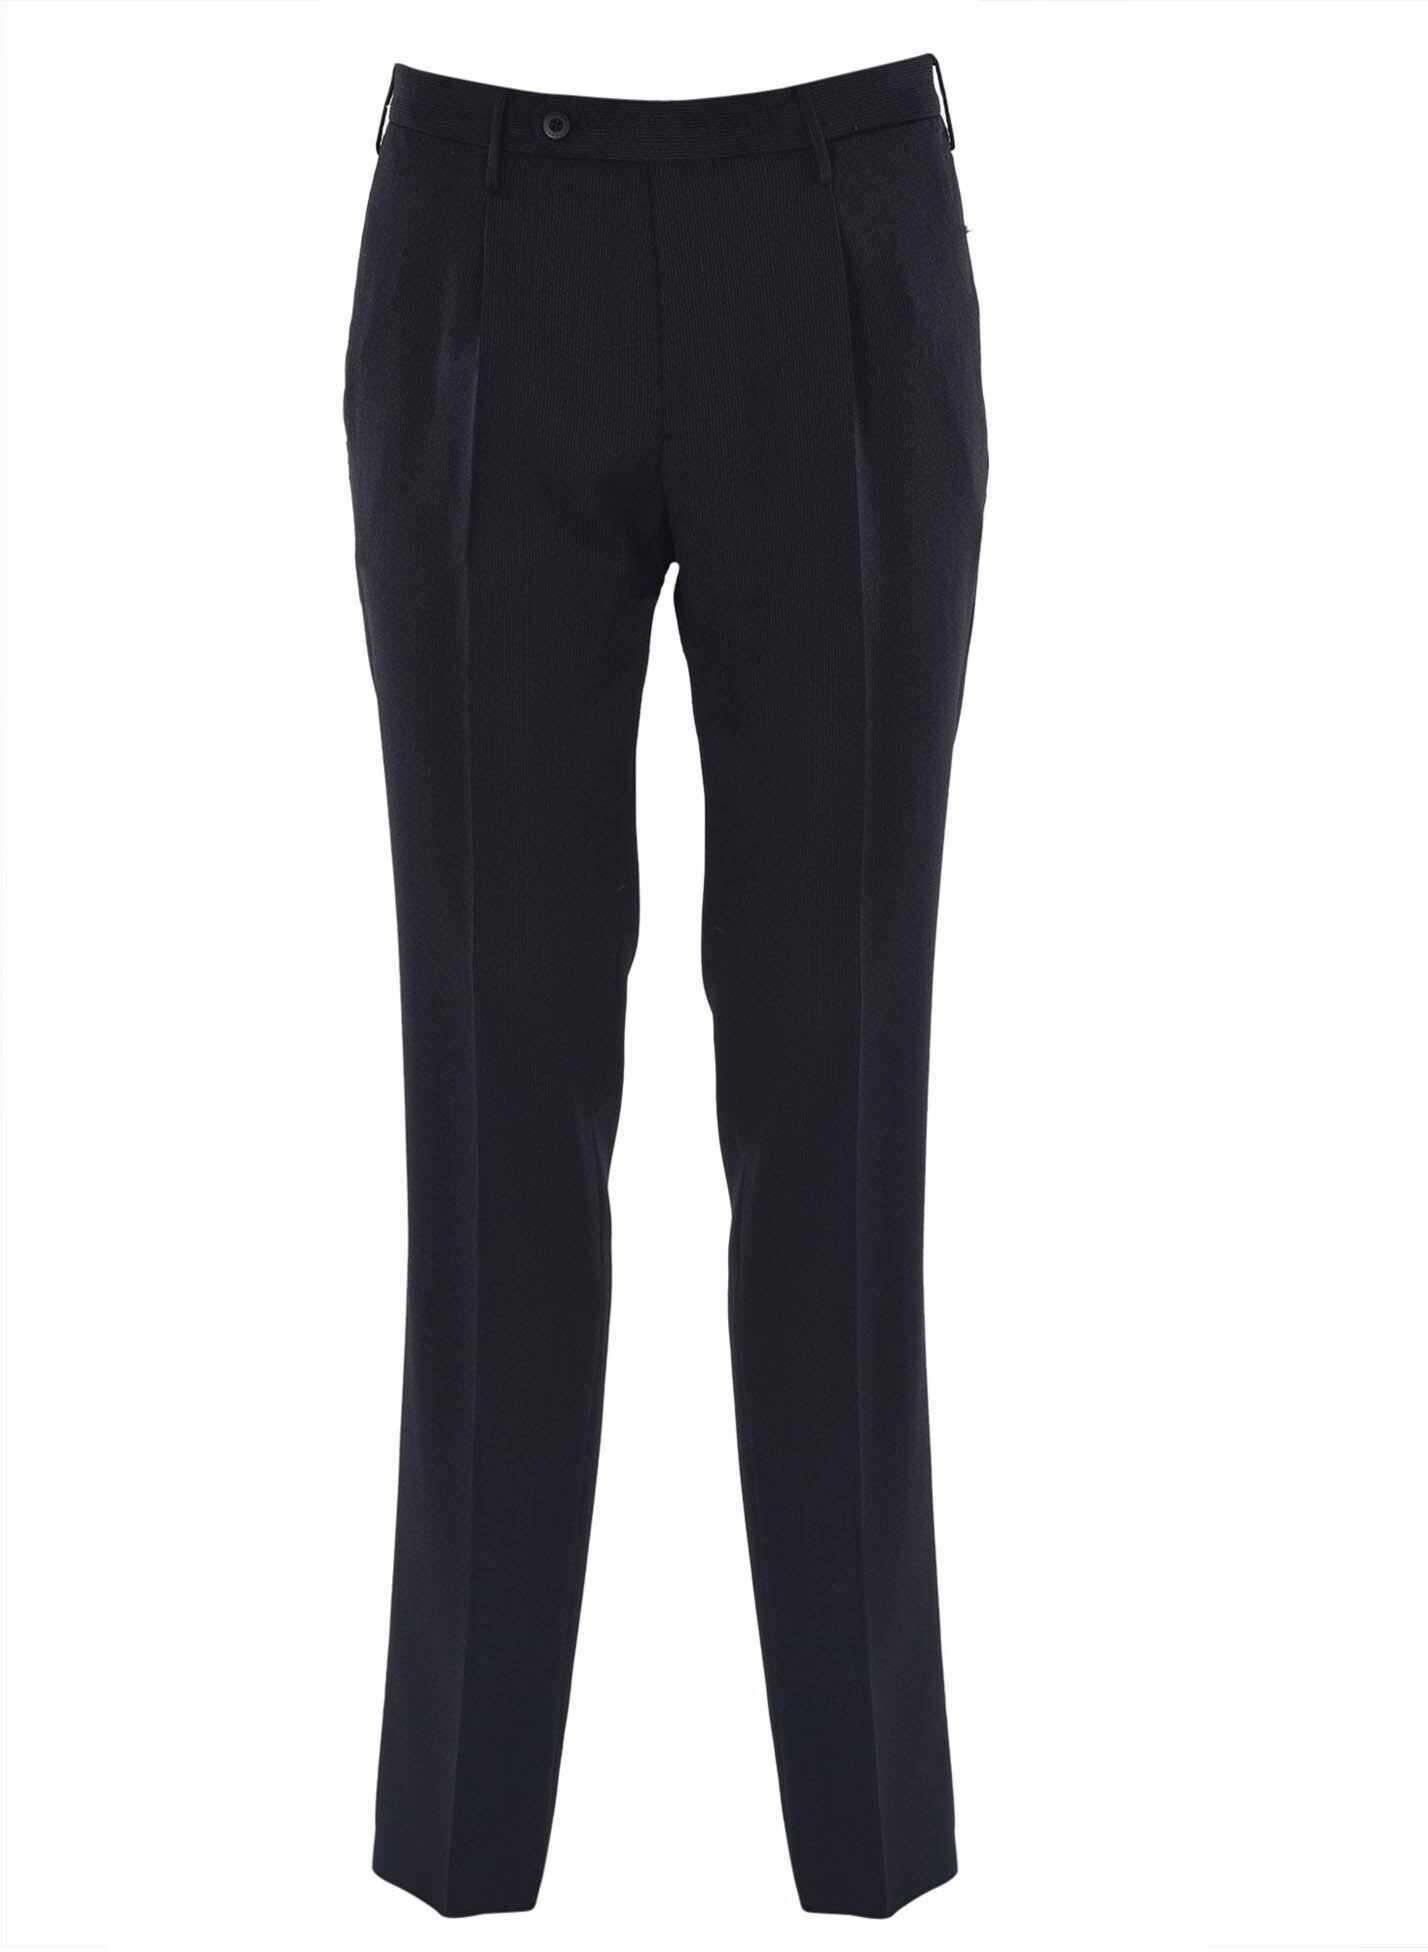 Incotex Micro-Striped Pants In Black Black imagine